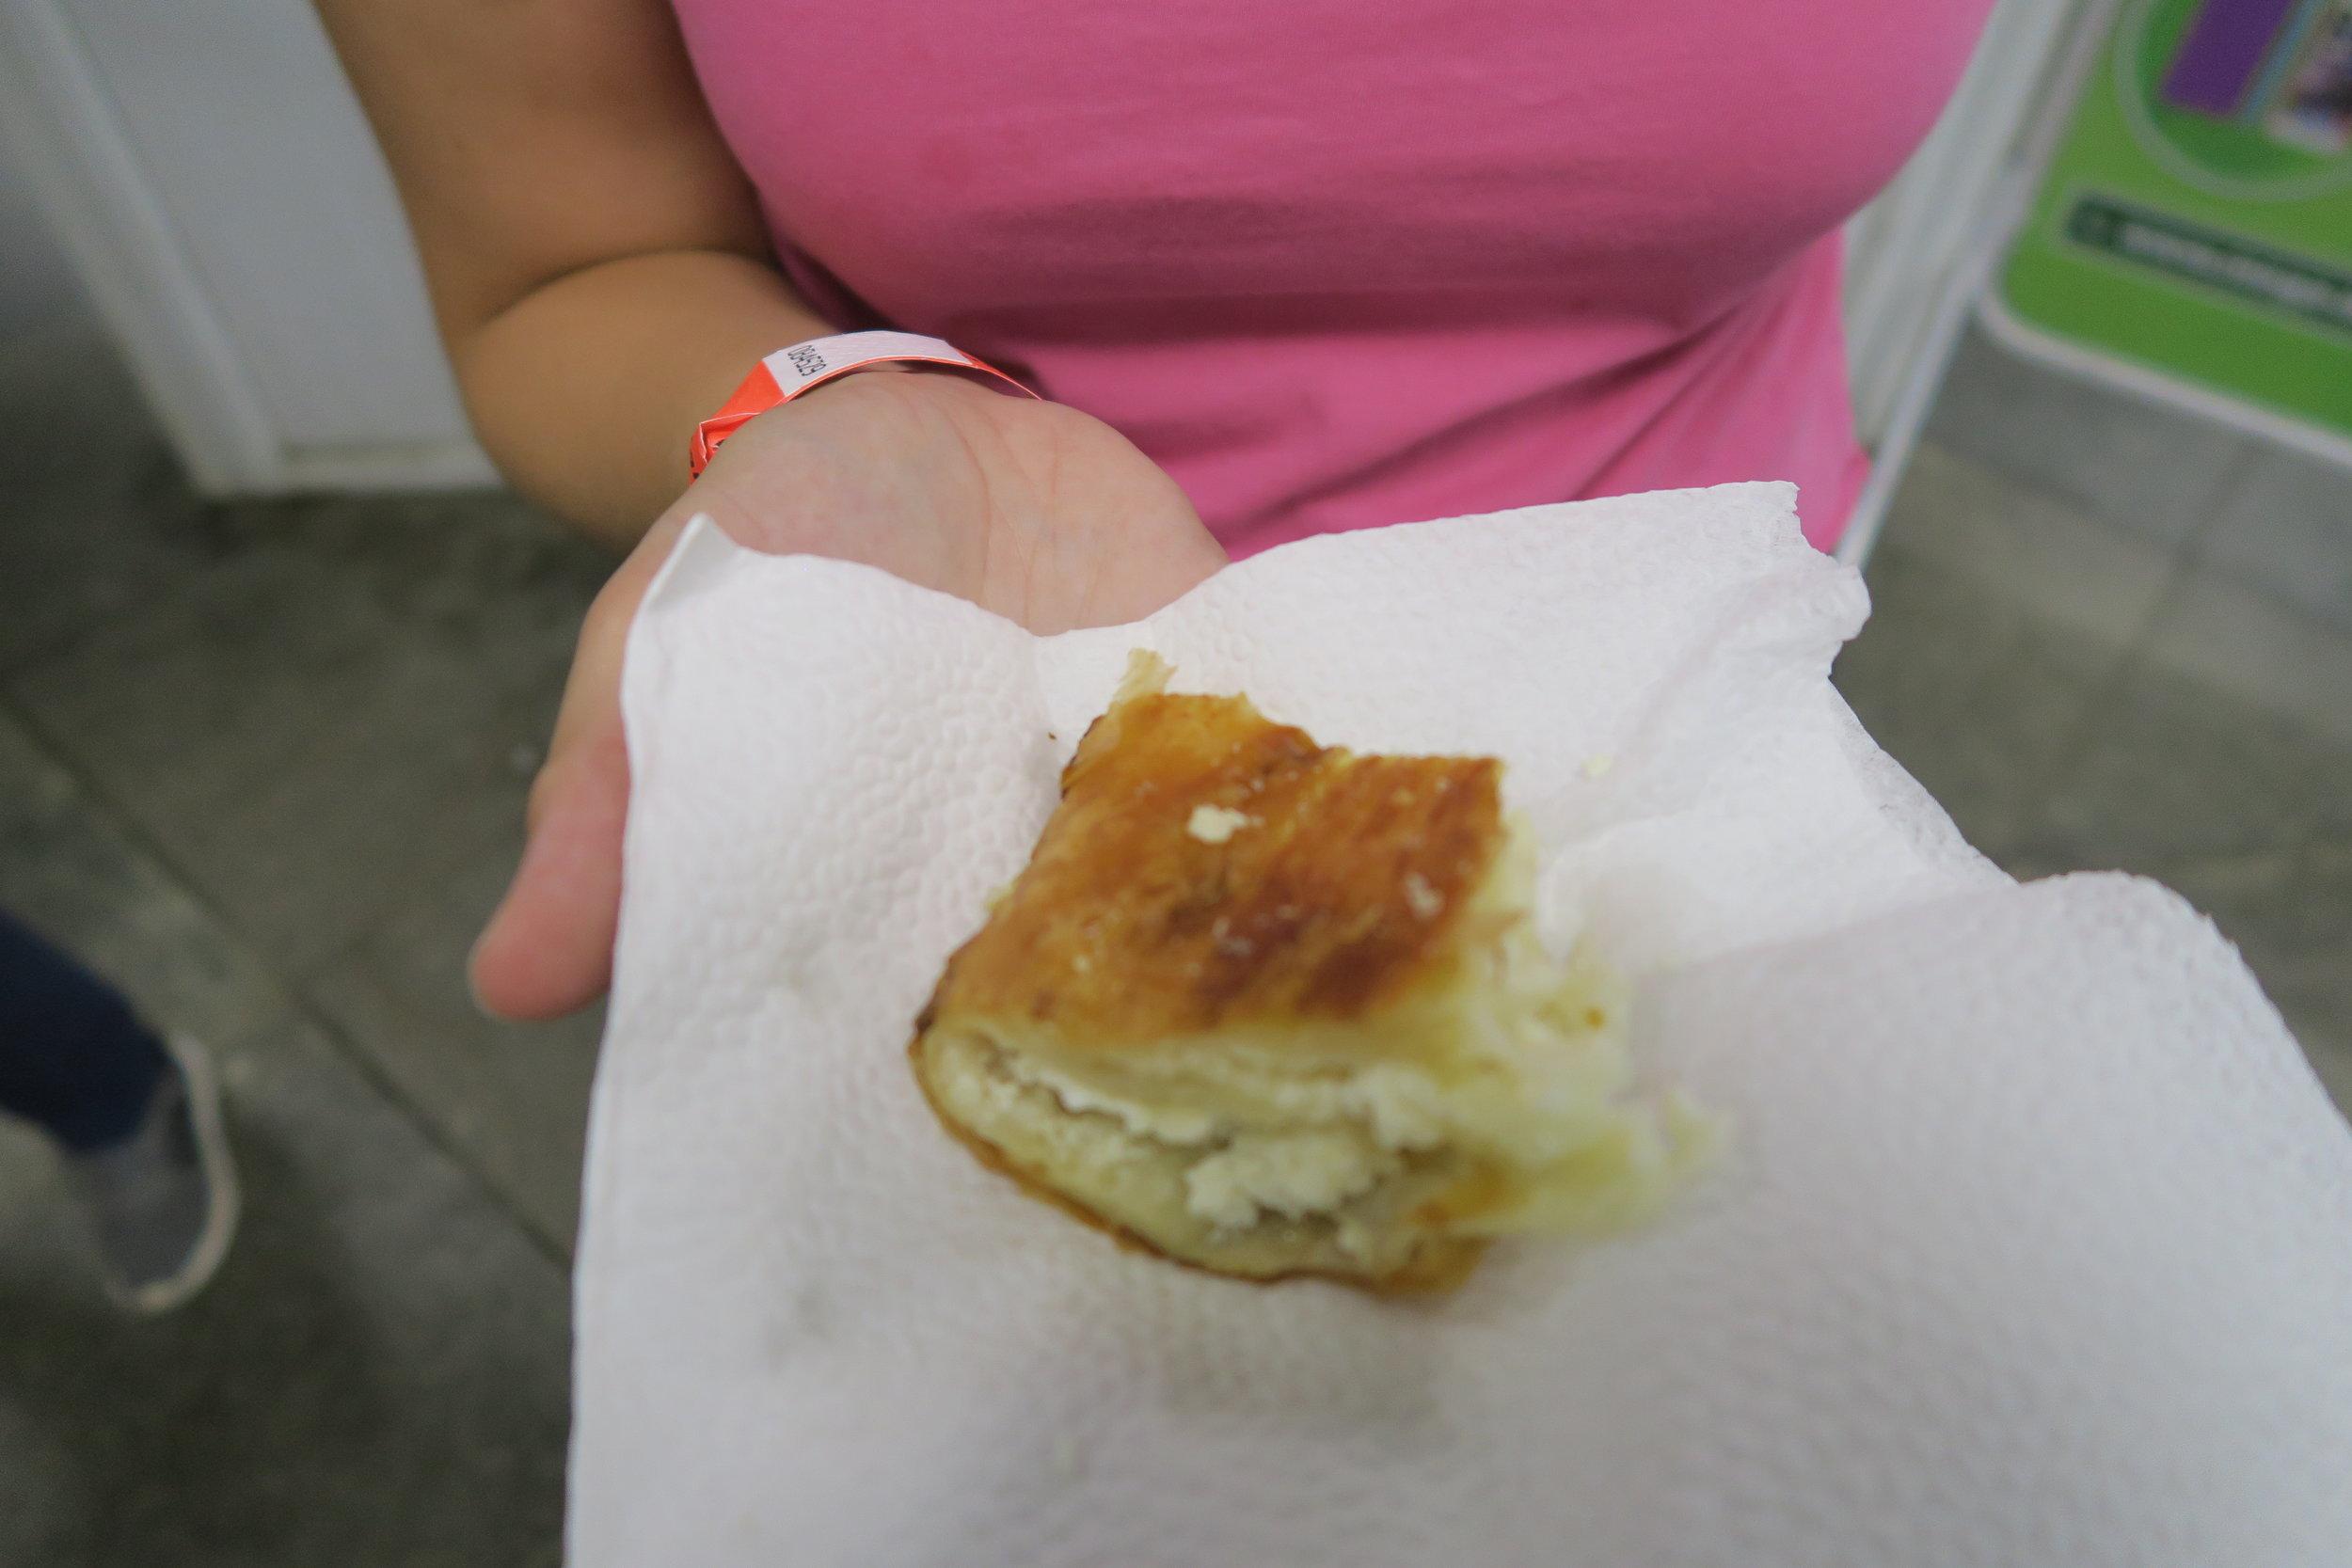 Just a smidge of glorious cheese banitsa in Sofia, Bulgaria